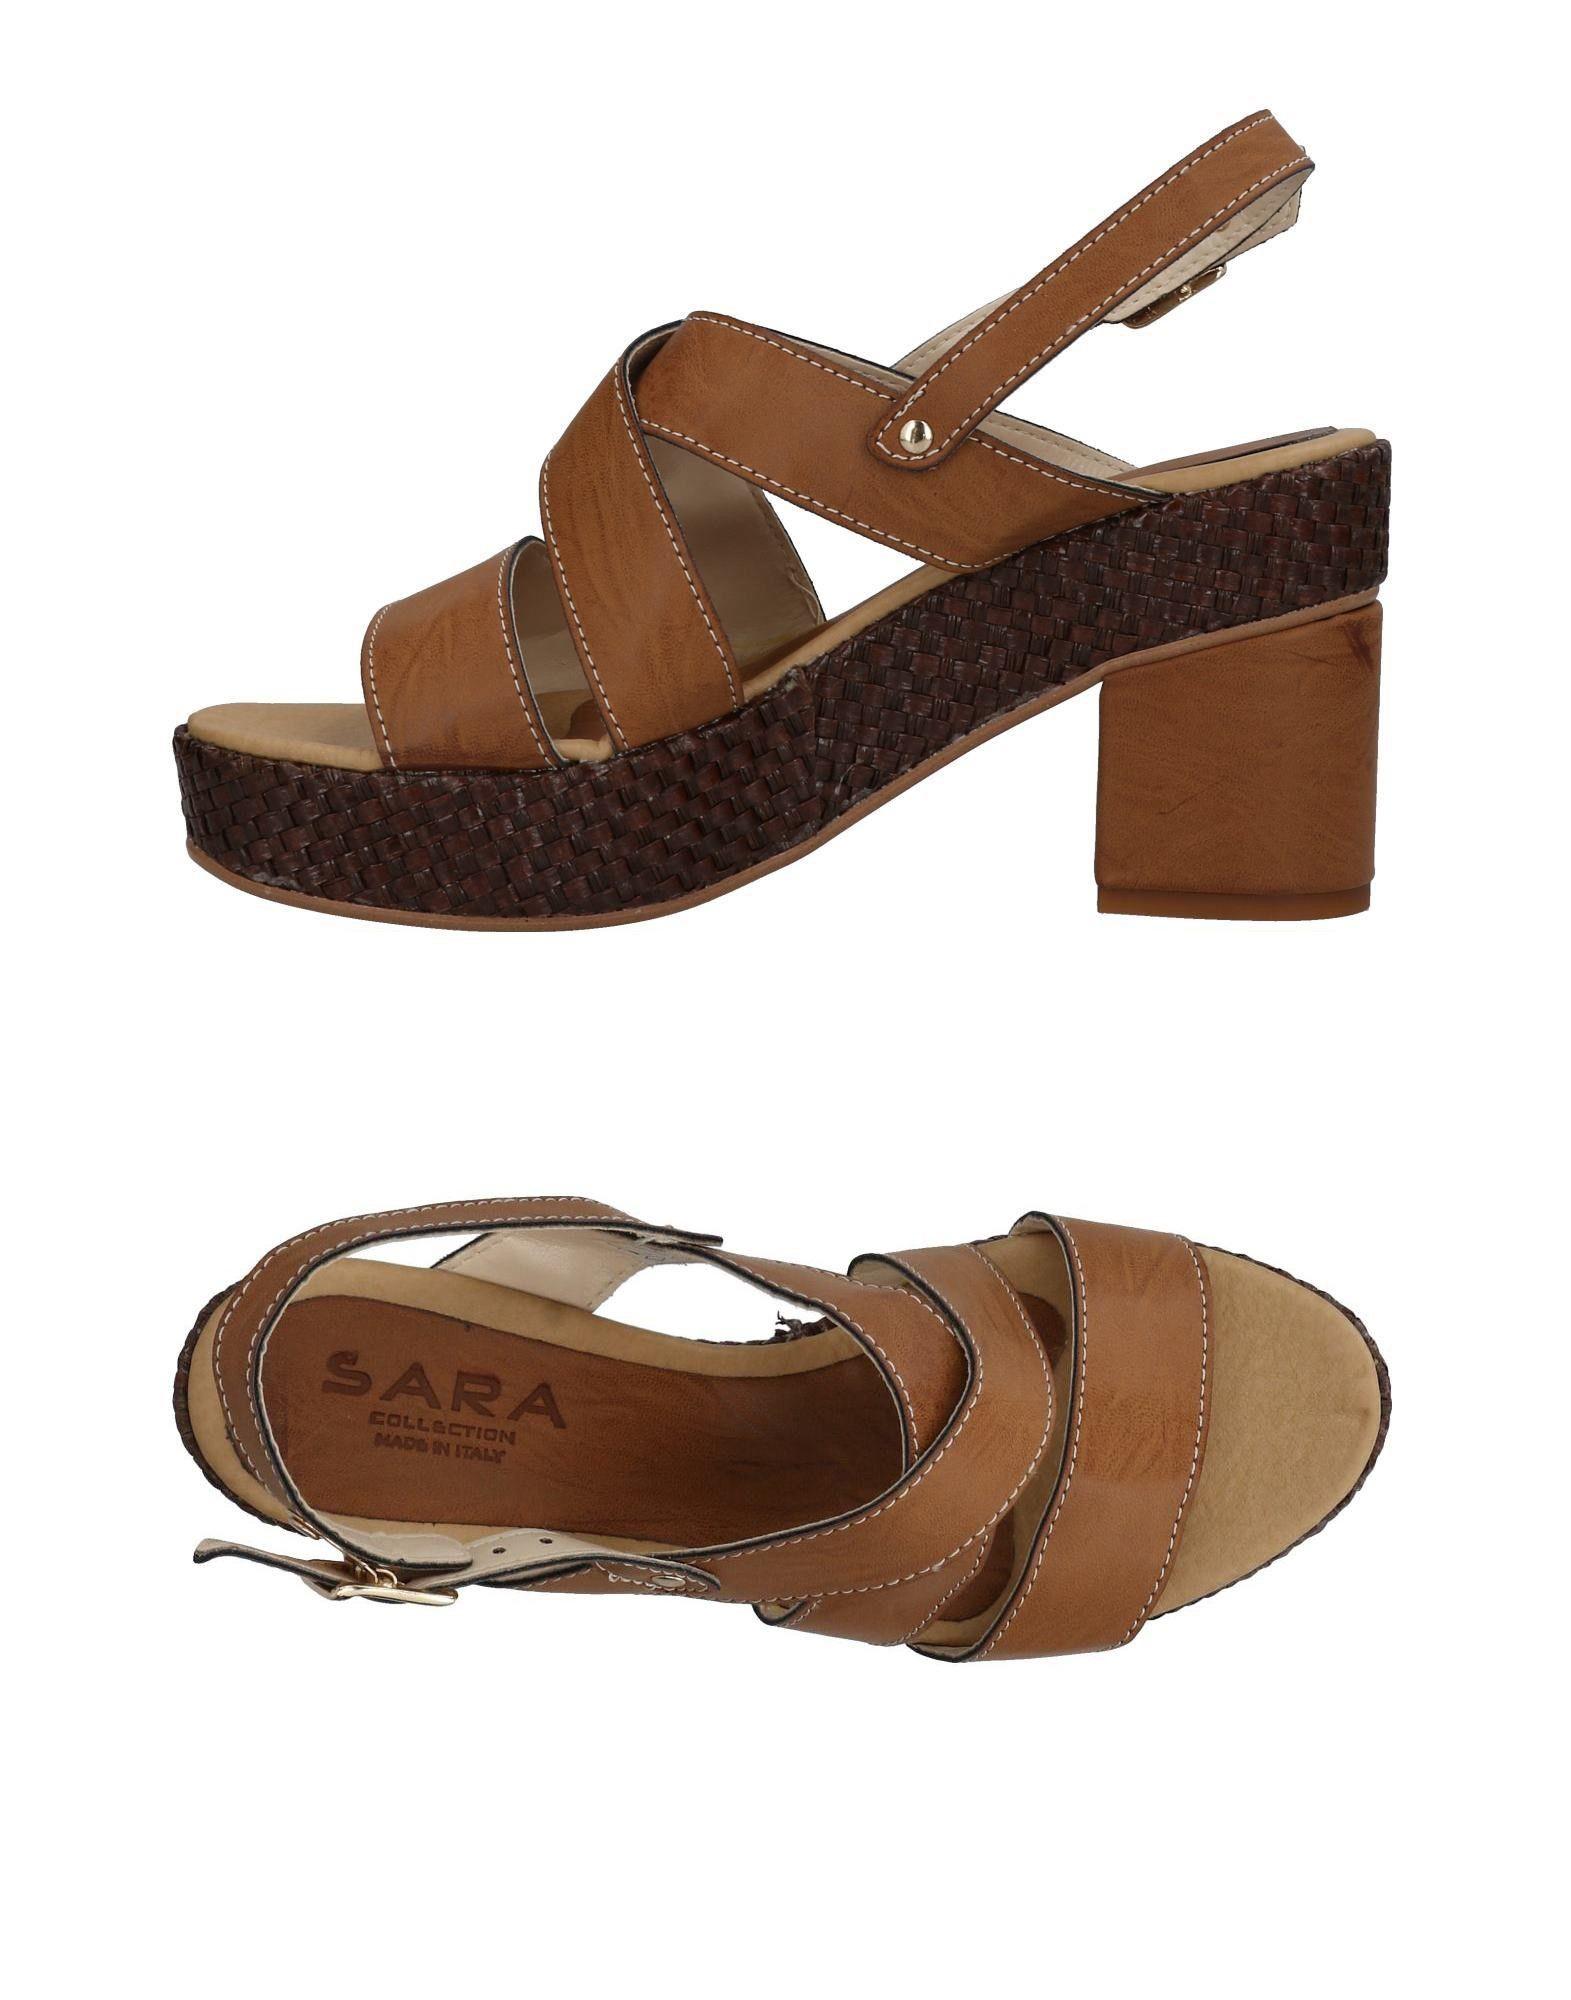 Sara® Collection Sandalen Damen  11423940JB Gute Qualität beliebte Schuhe